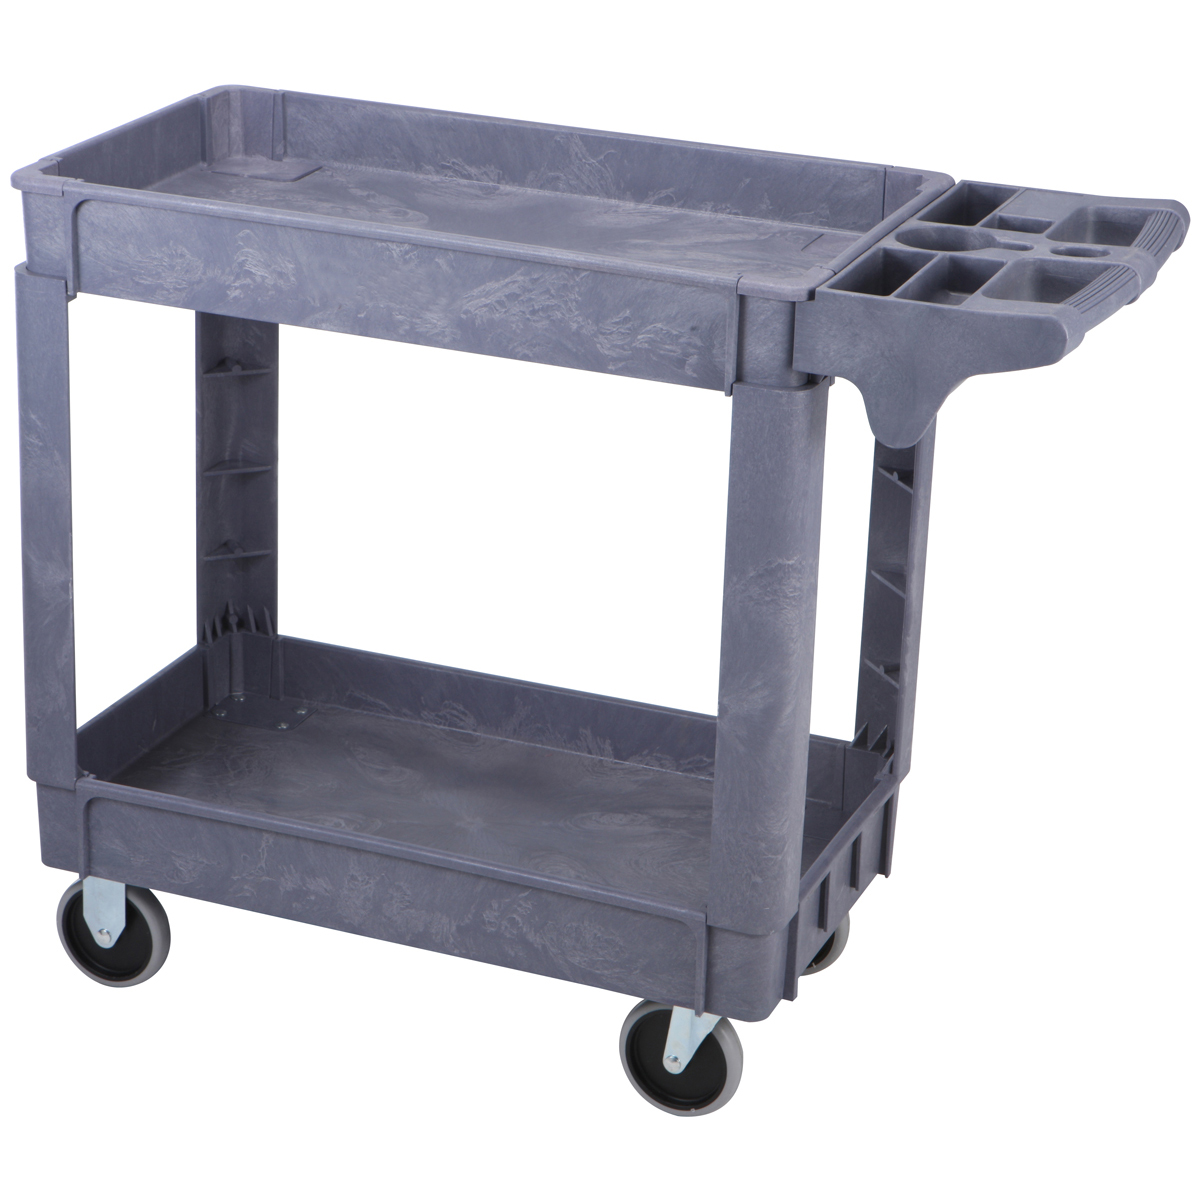 16 In X 30 In Industrial Polypropylene Service Cart